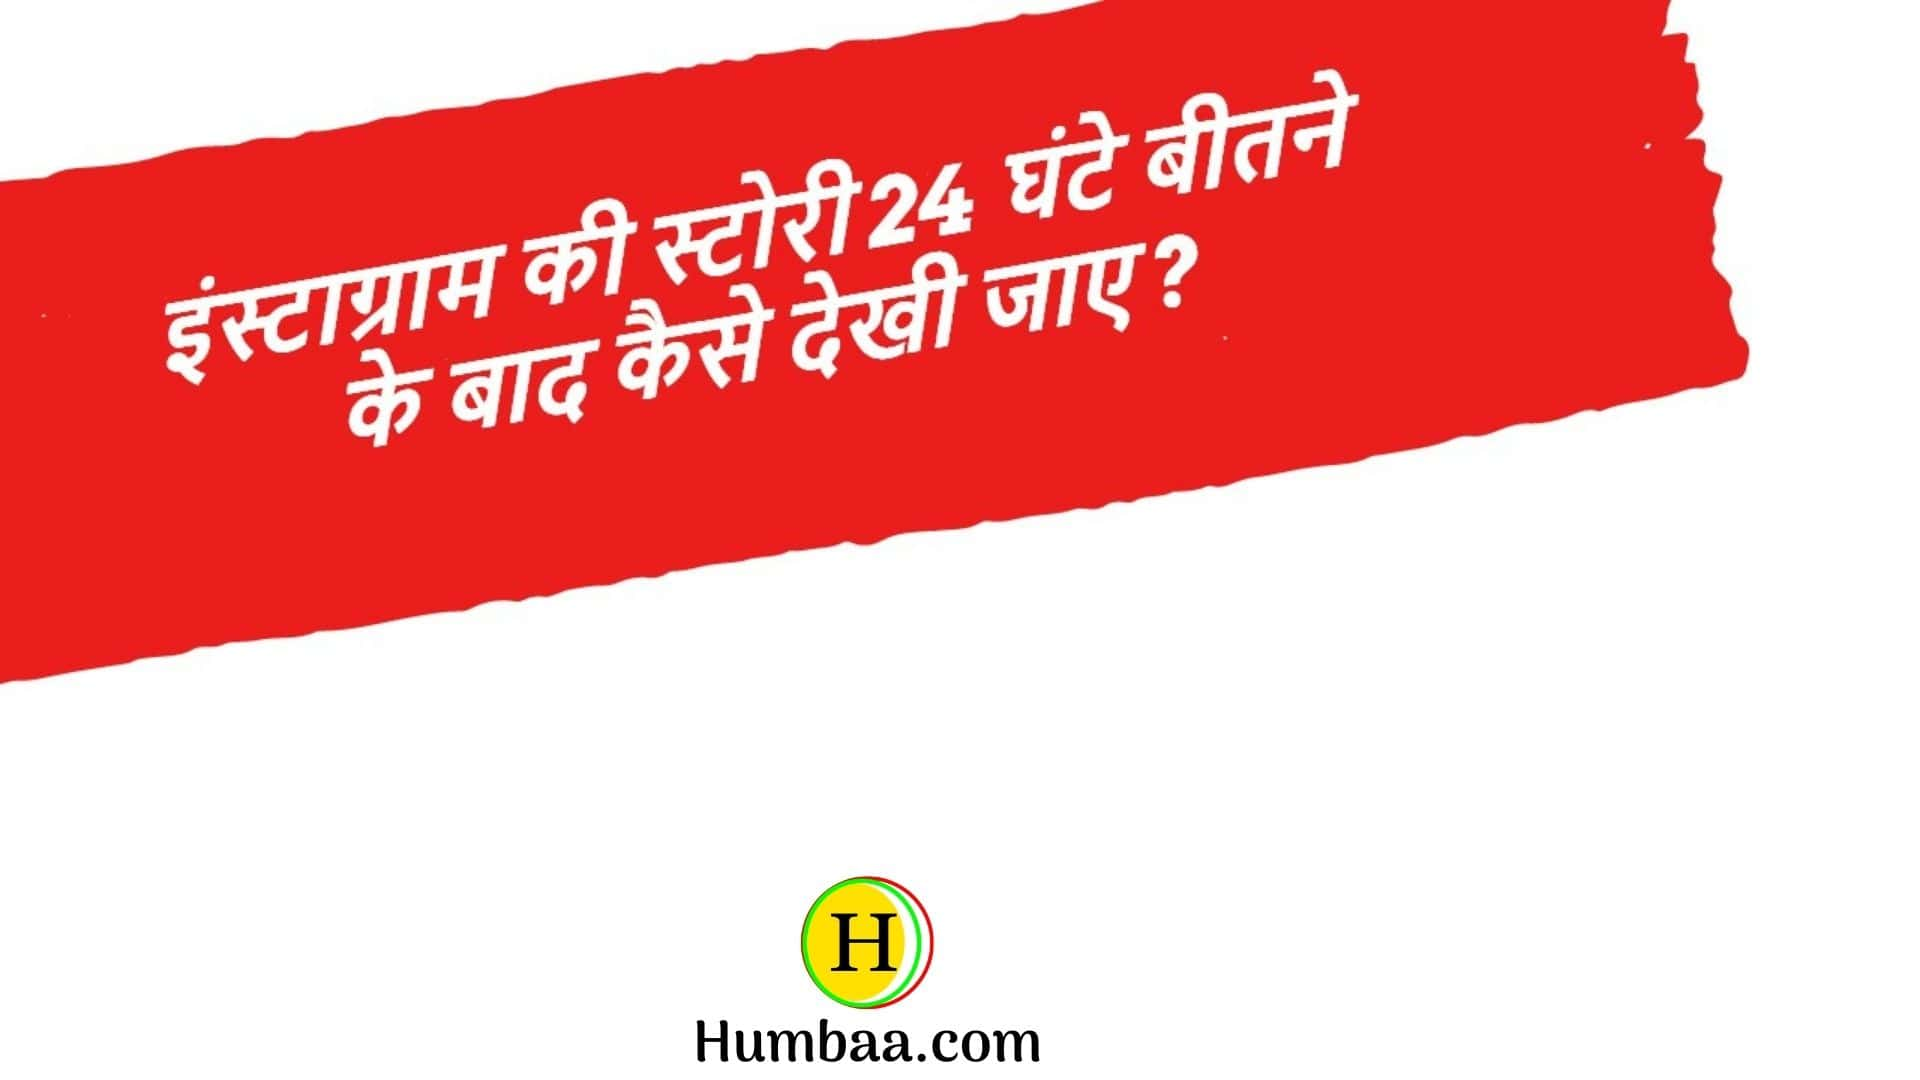 Instagram Stories ko 24 hours bitne baad bhi kaise dekhe?